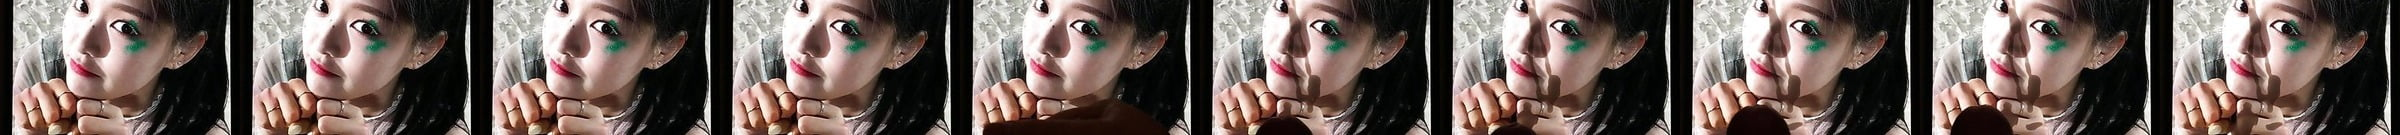 Koreanisches Sexvideo 2